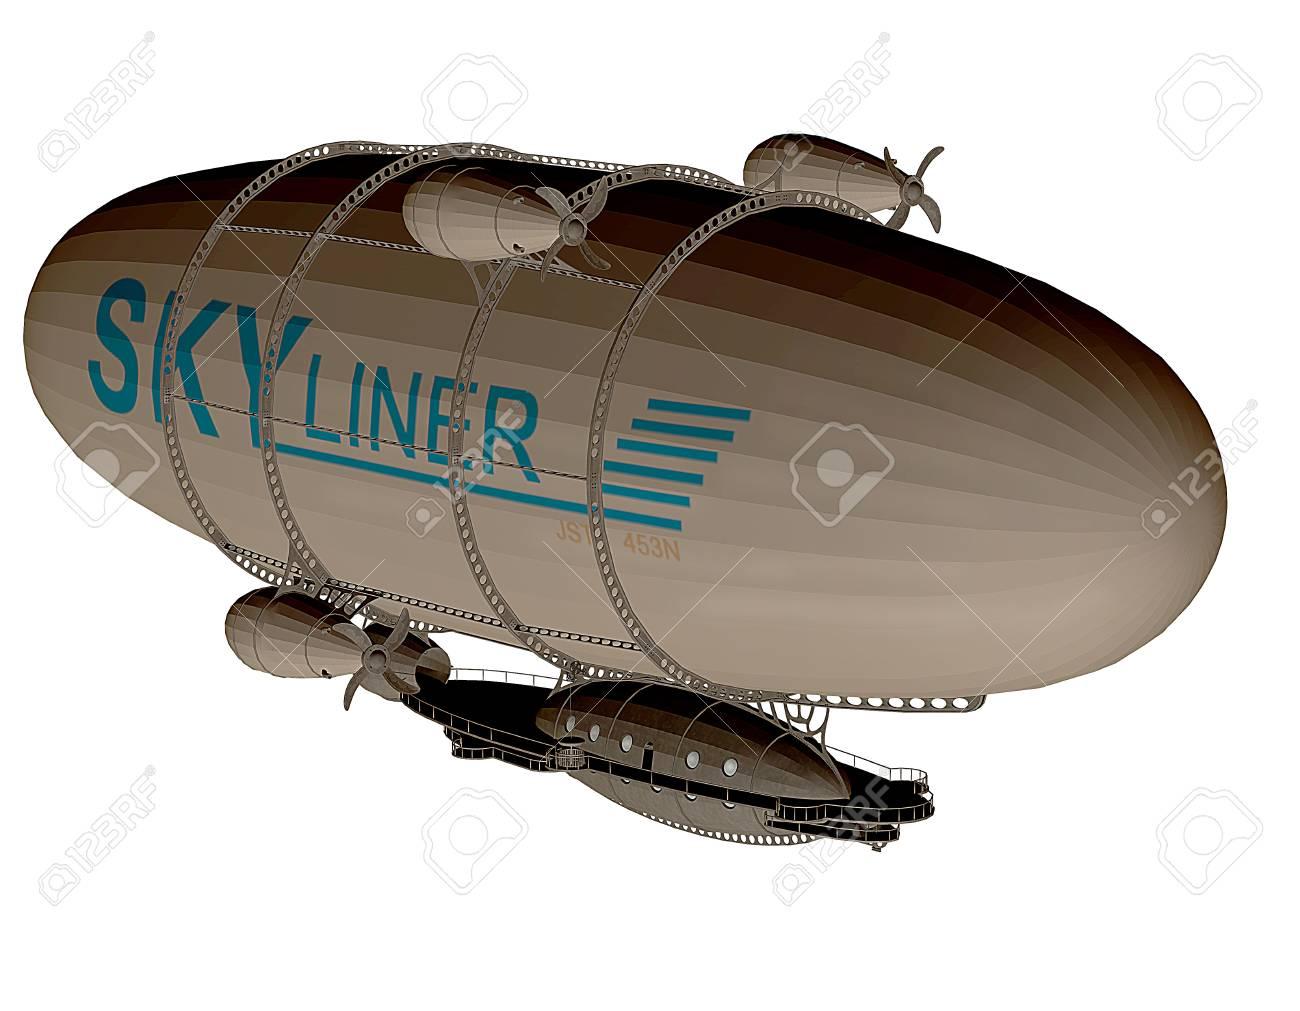 3d rendering of a Zeppelin as an illustration Stock Illustration - 17090119